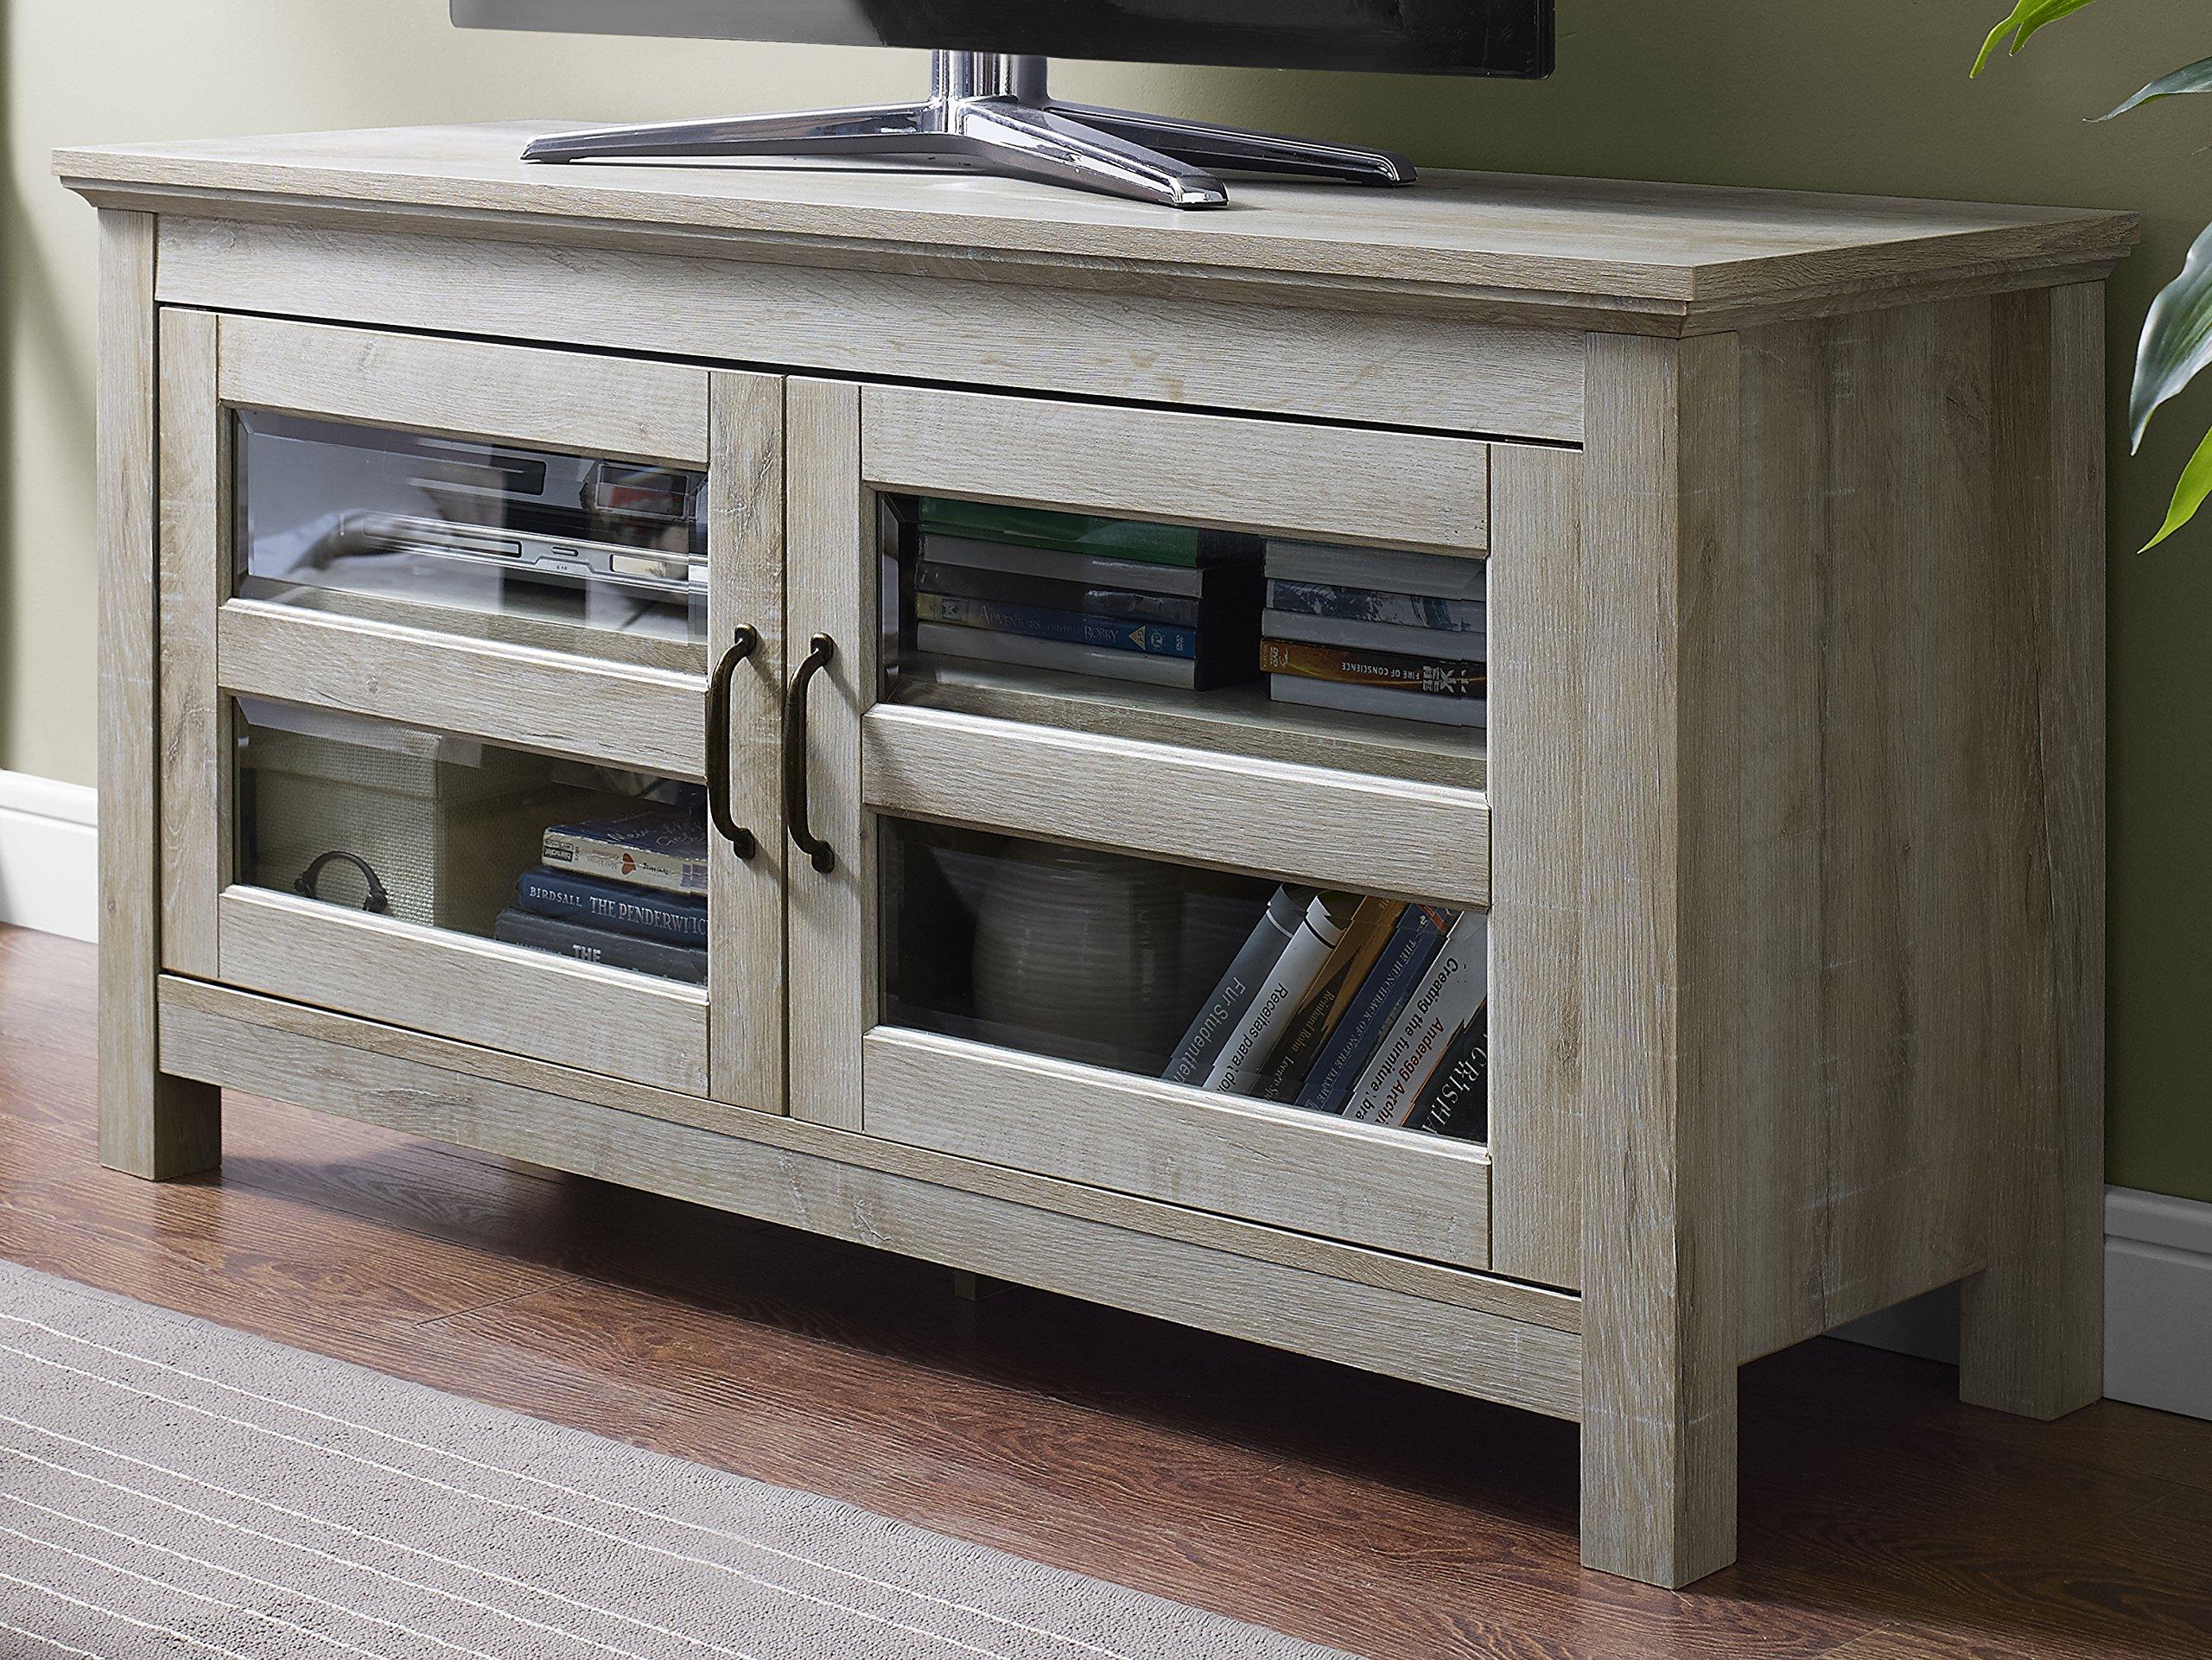 WE Furniture 44'' Wood TV Media Stand Storage Console - White Oak